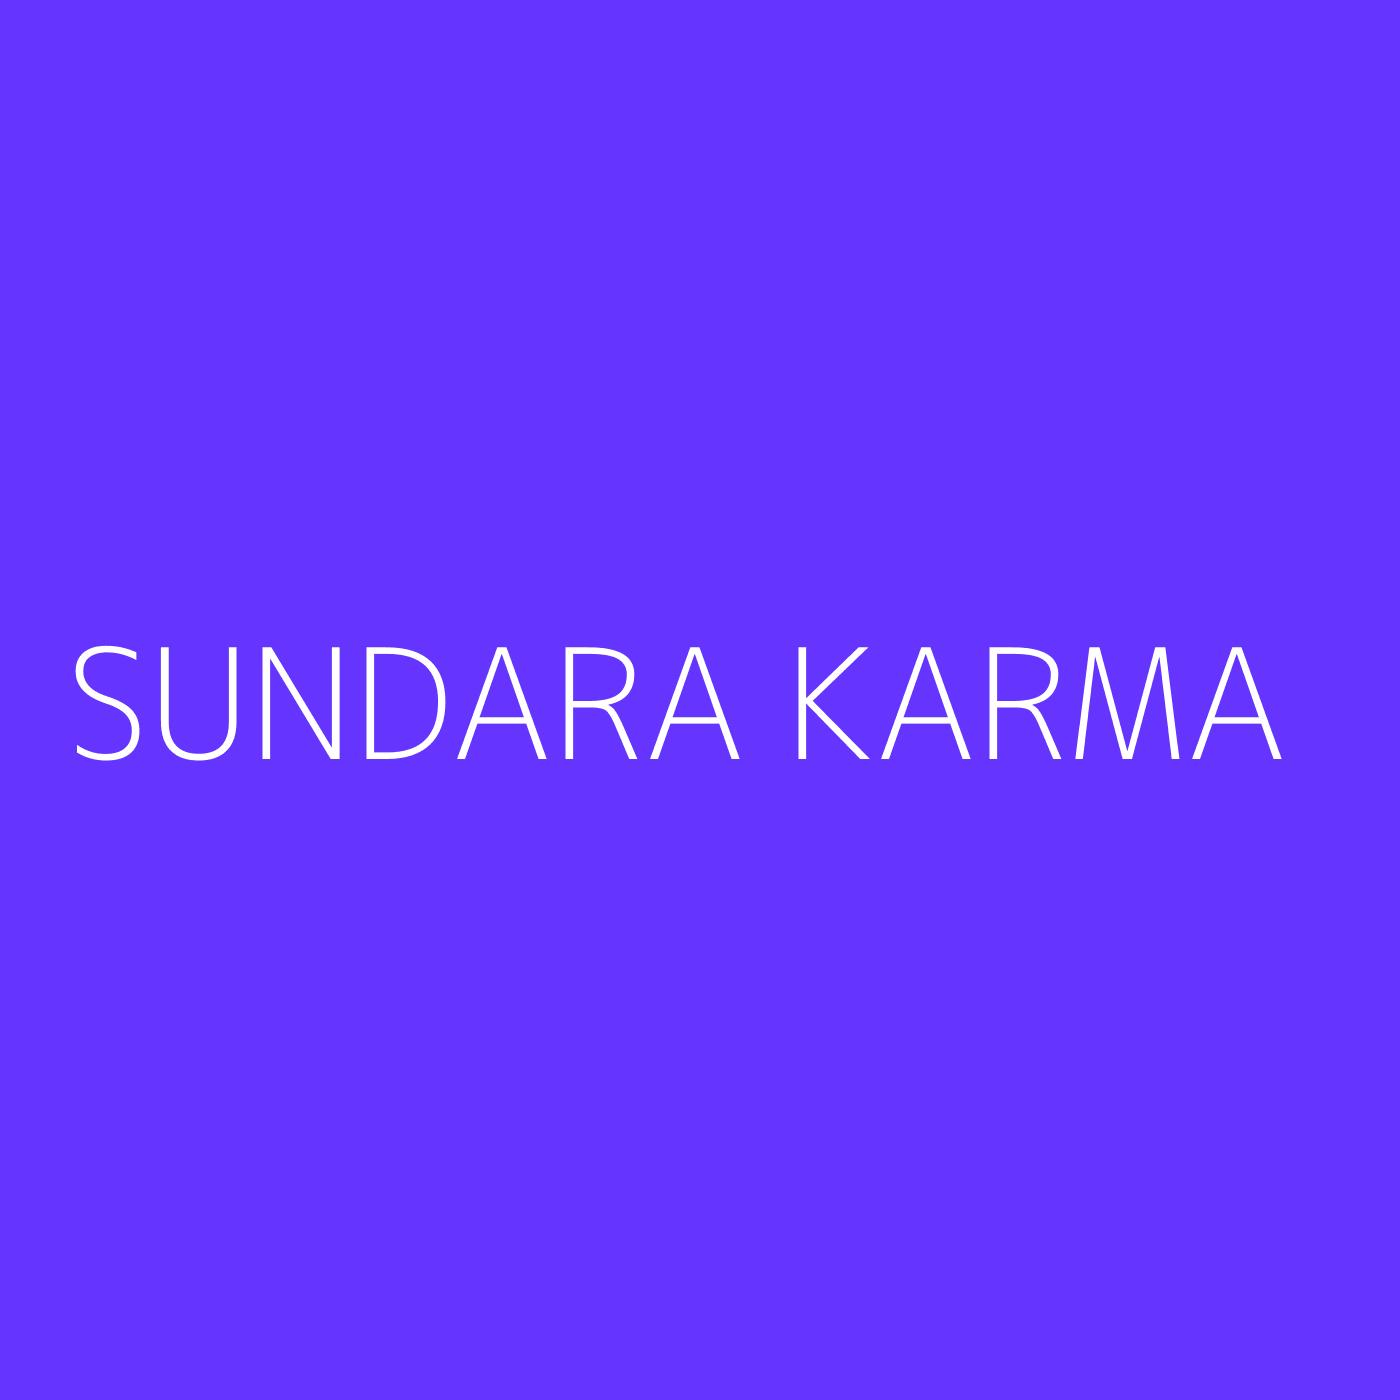 Sundara Karma Playlist Artwork